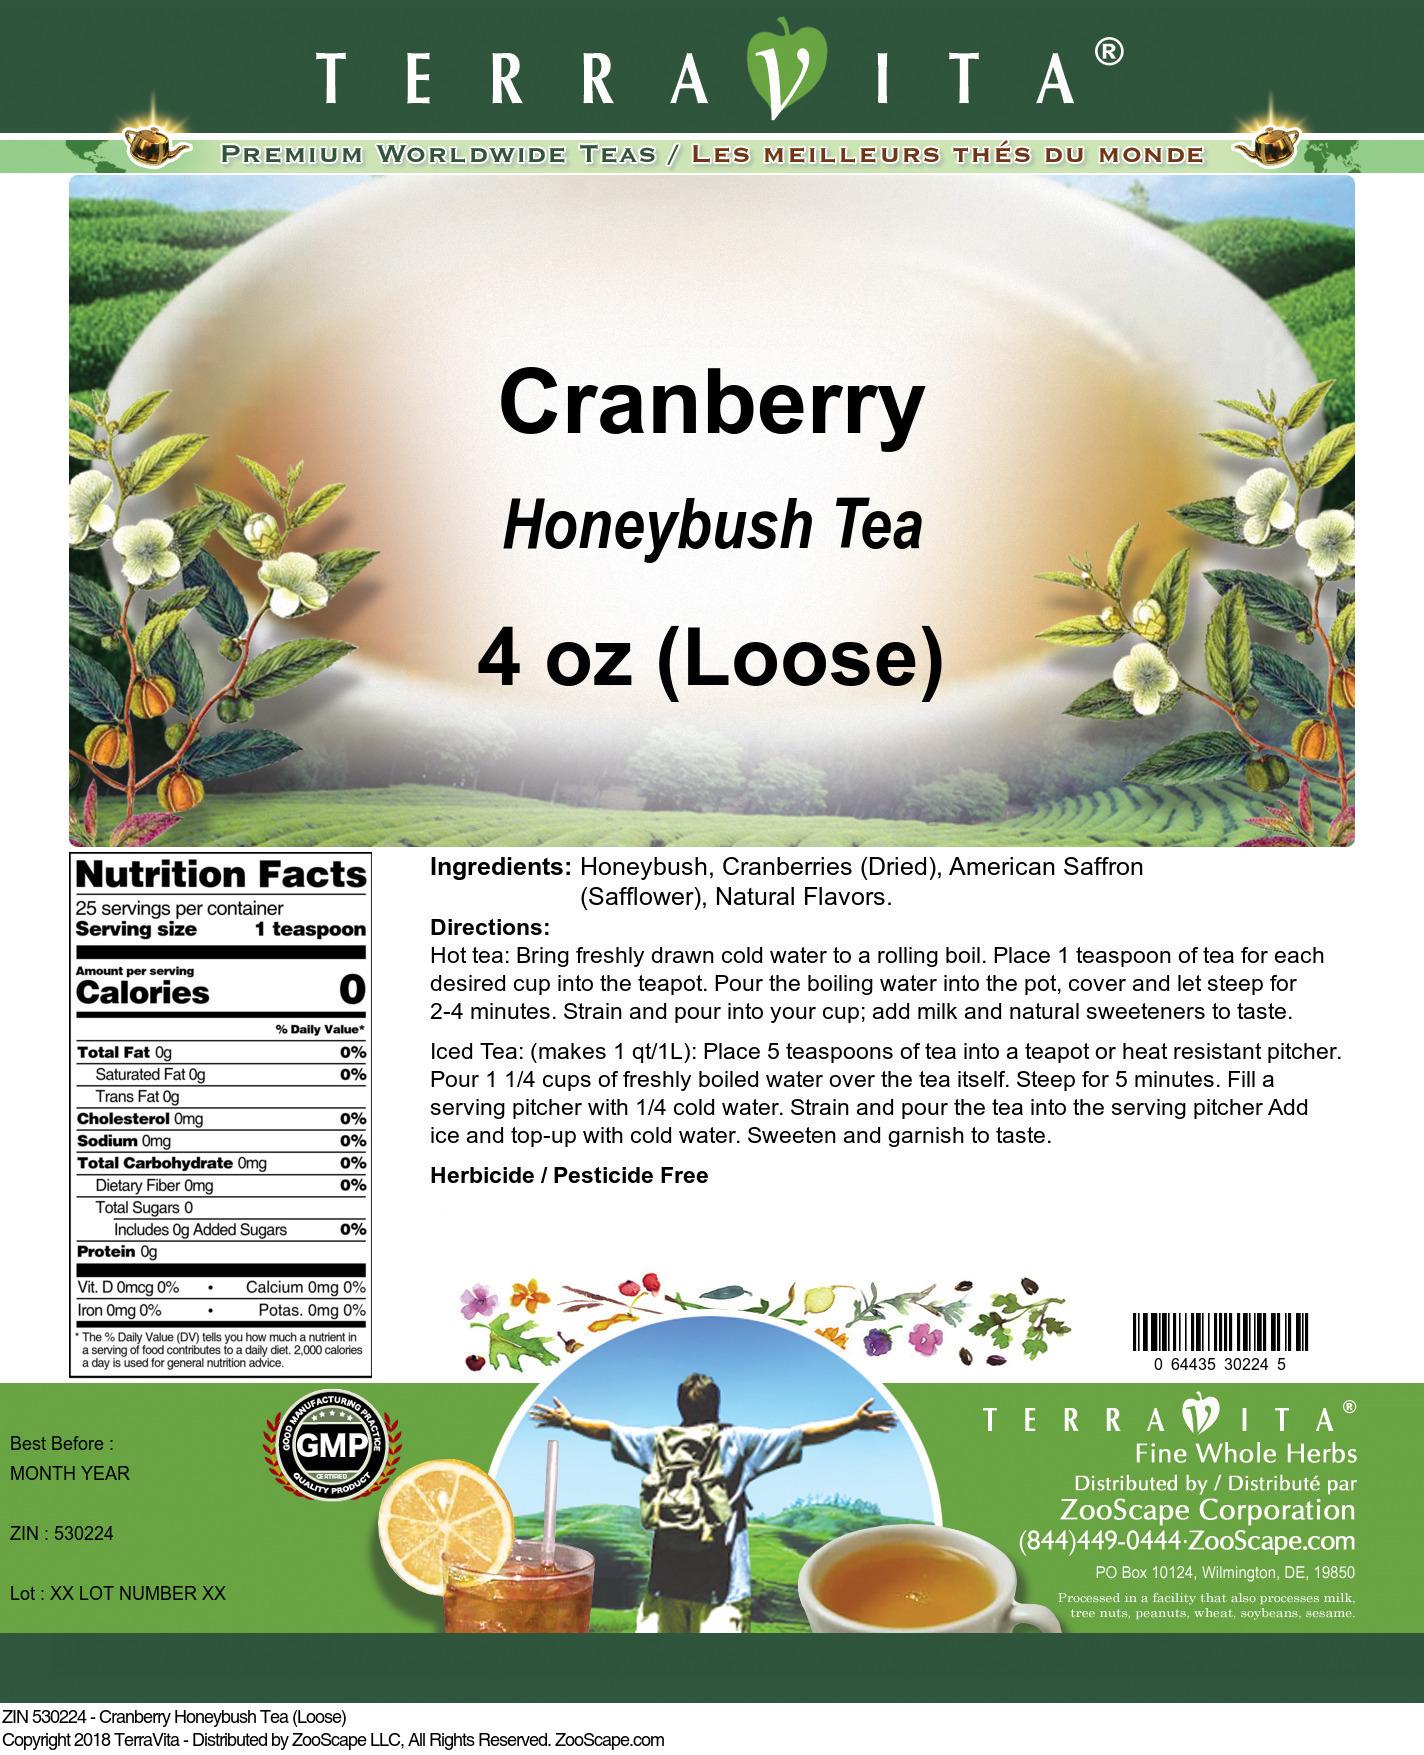 Cranberry Honeybush Tea (Loose)